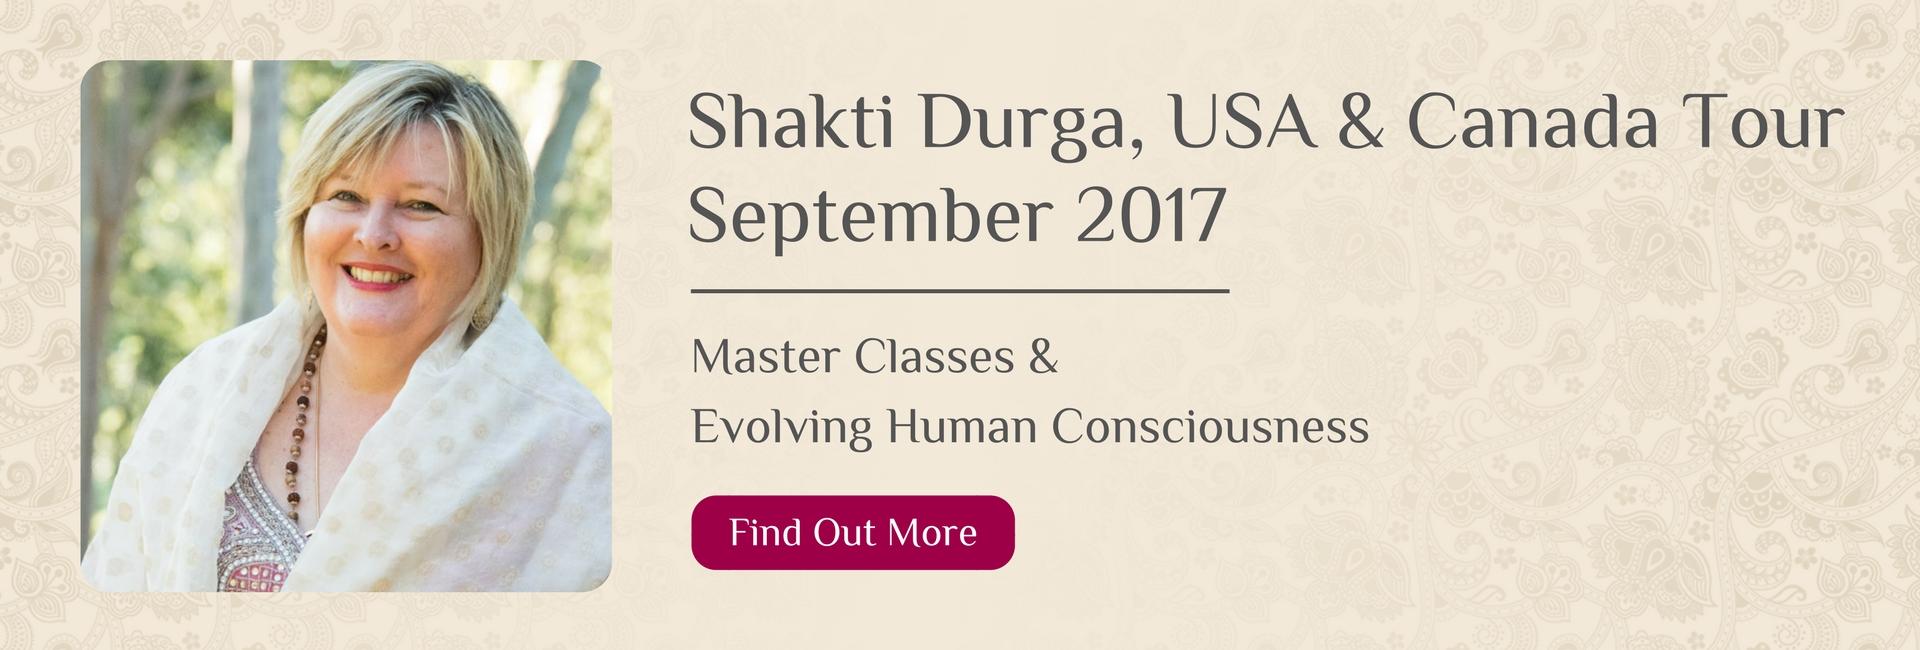 Shakti Durga USA & Canada Tour September 2017